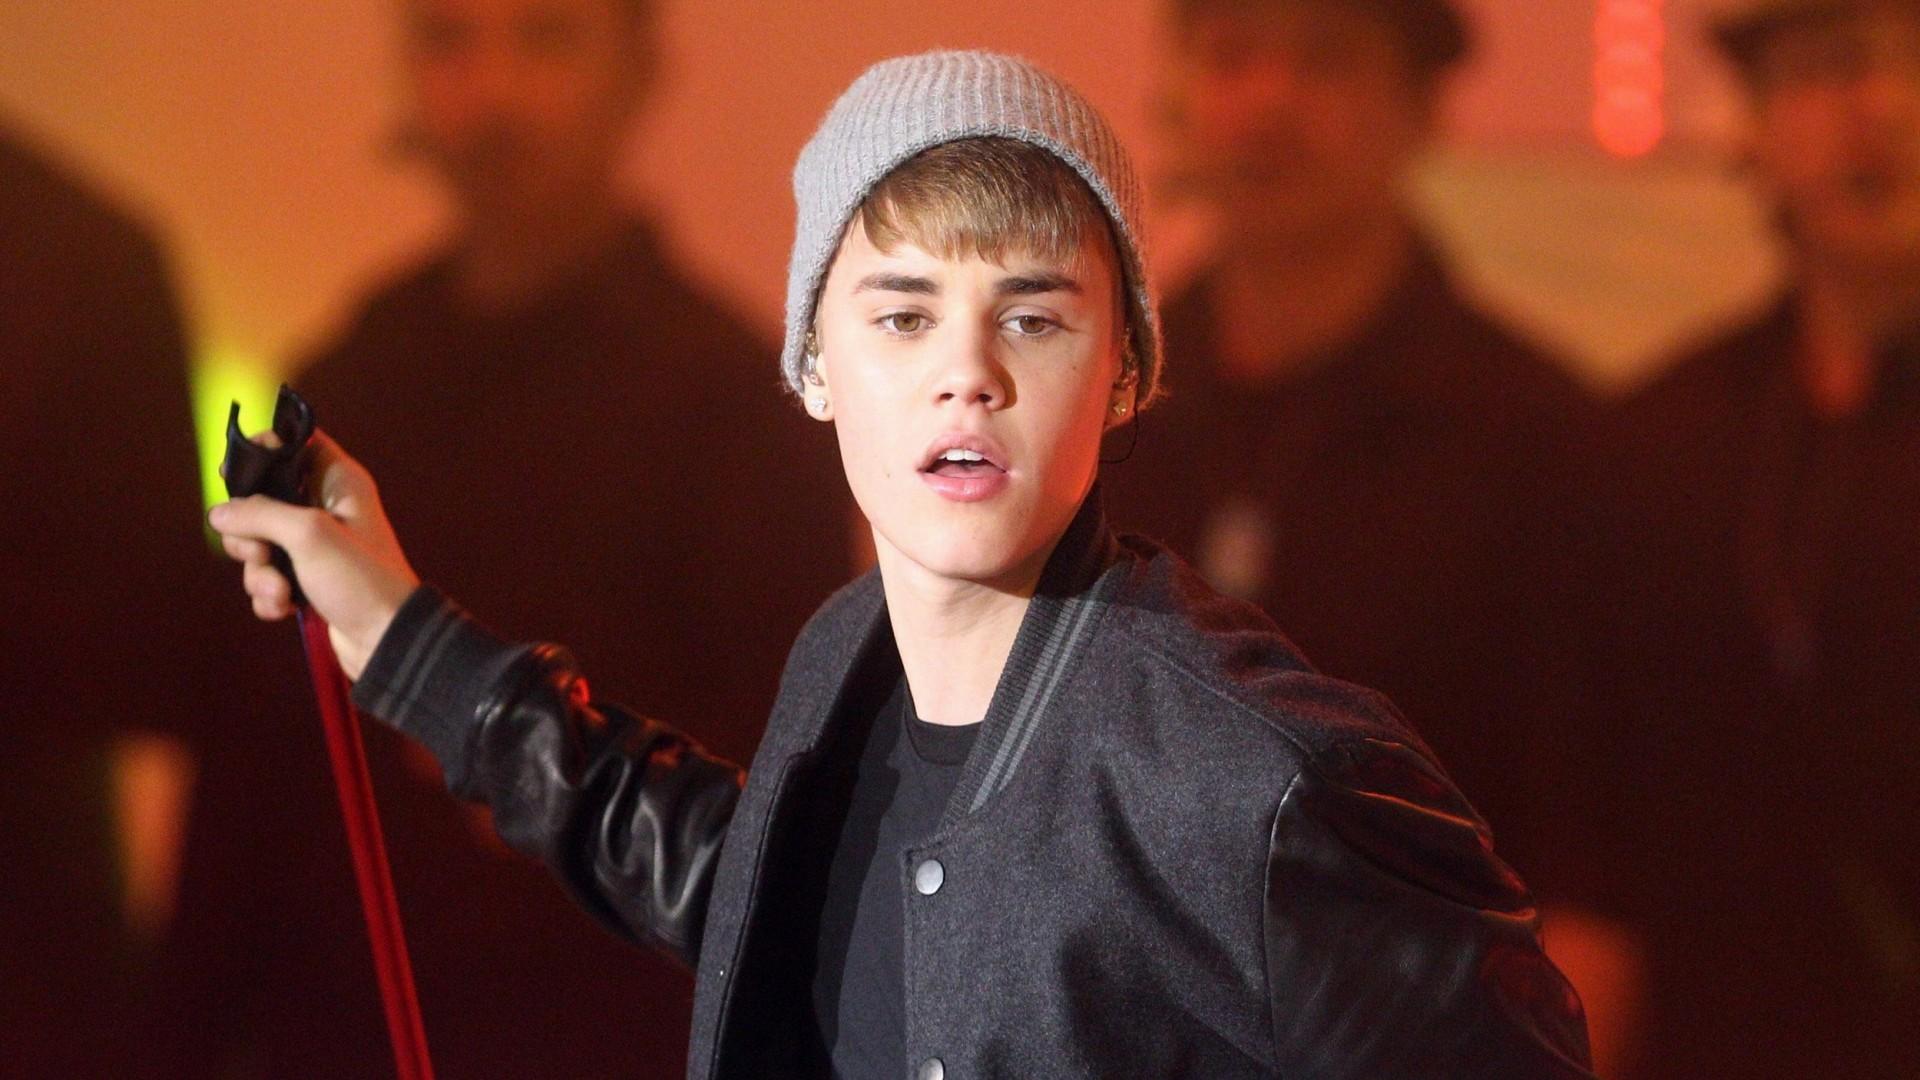 Wallpaper download justin bieber - Wallpaper Download Justin Bieber Download Justin Bieber Wallpaper Download